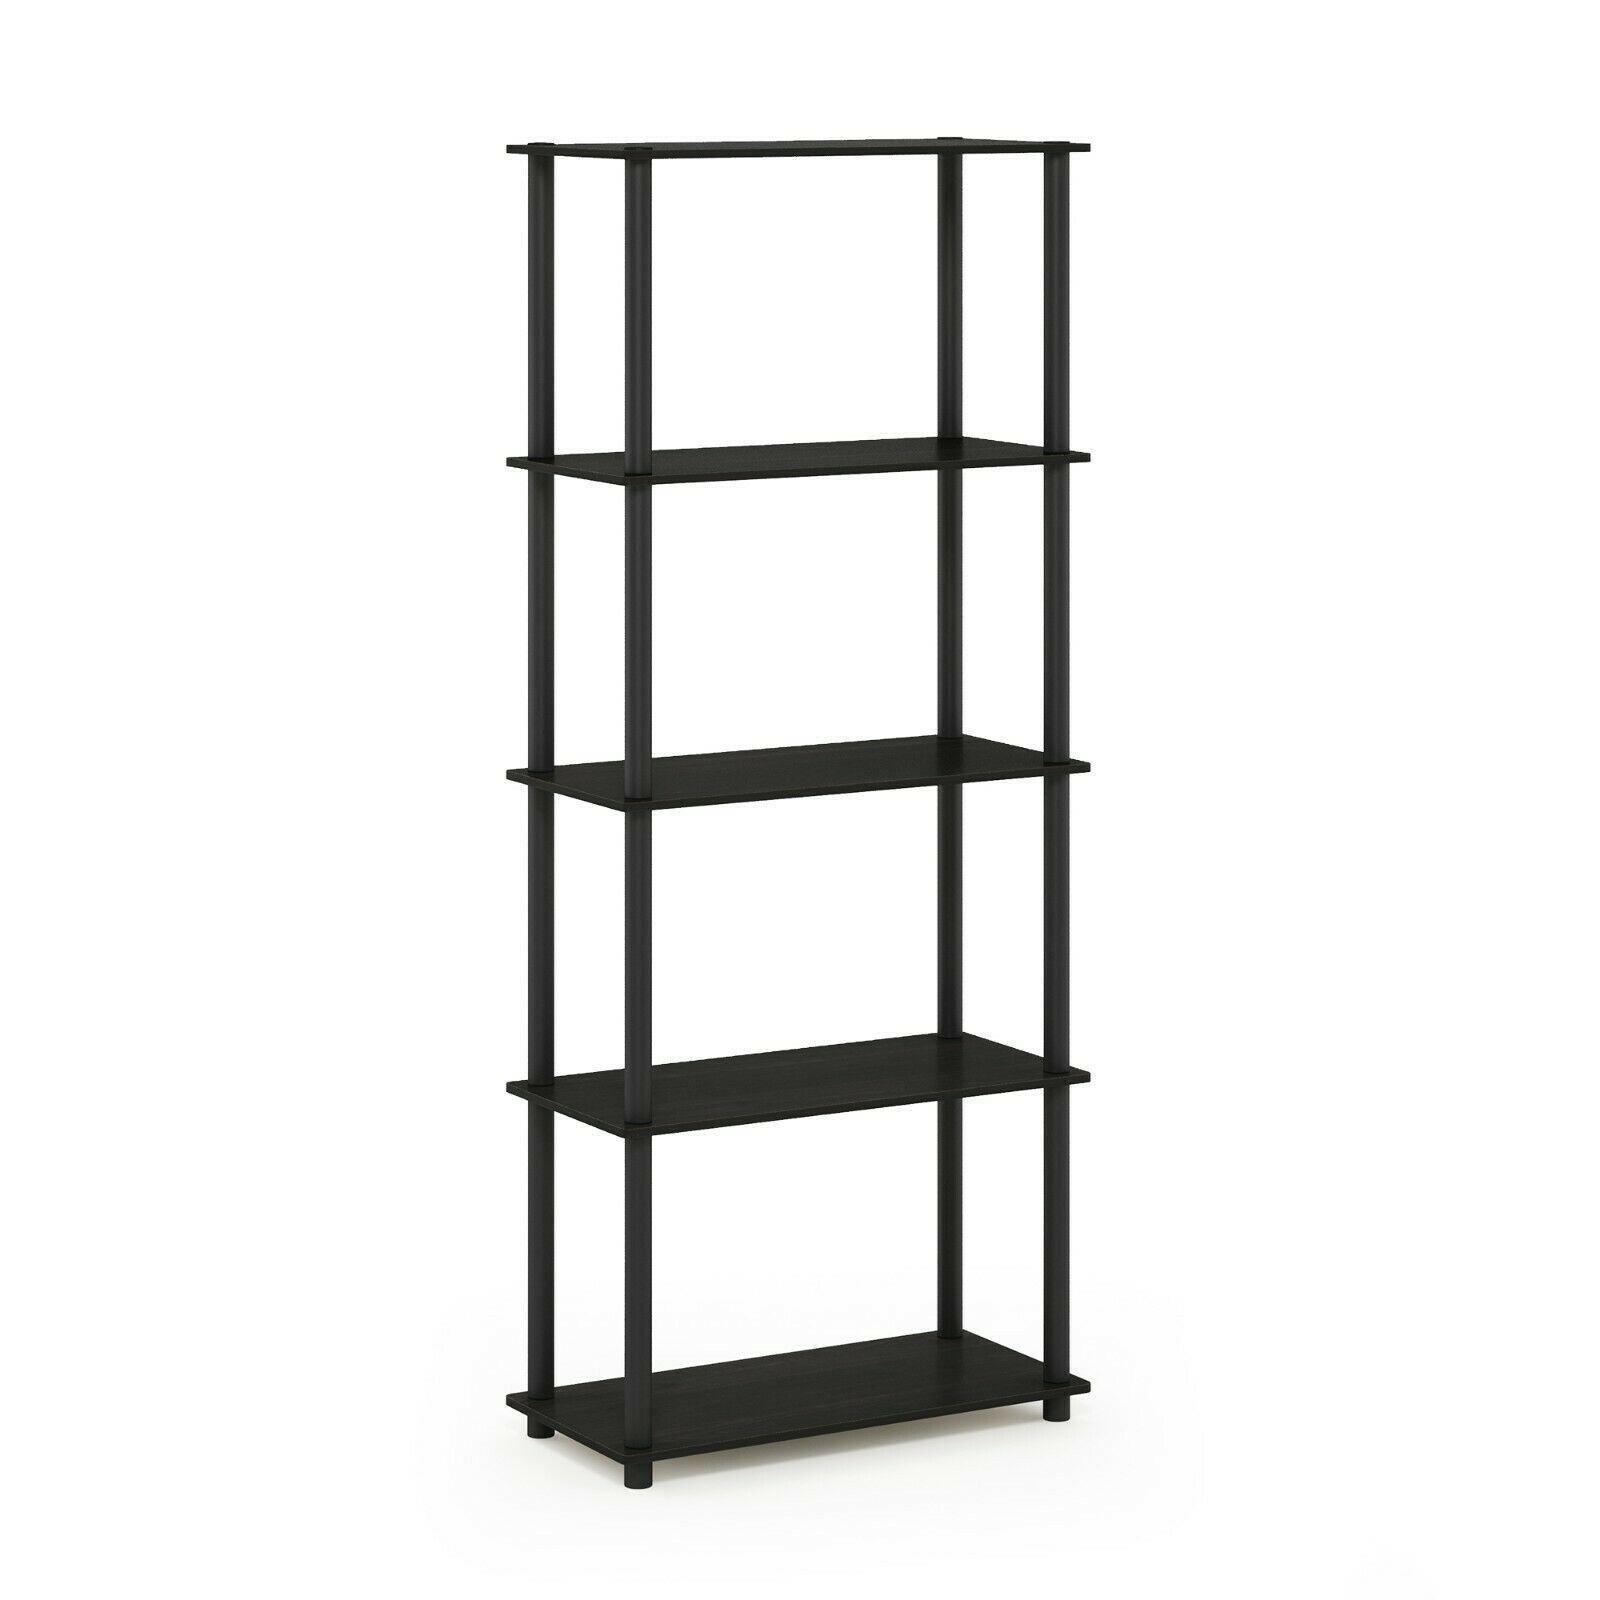 Furinno Turn-N-Tube 5-Tier Multipurpose Shelf Display Rack, Espresso/Black